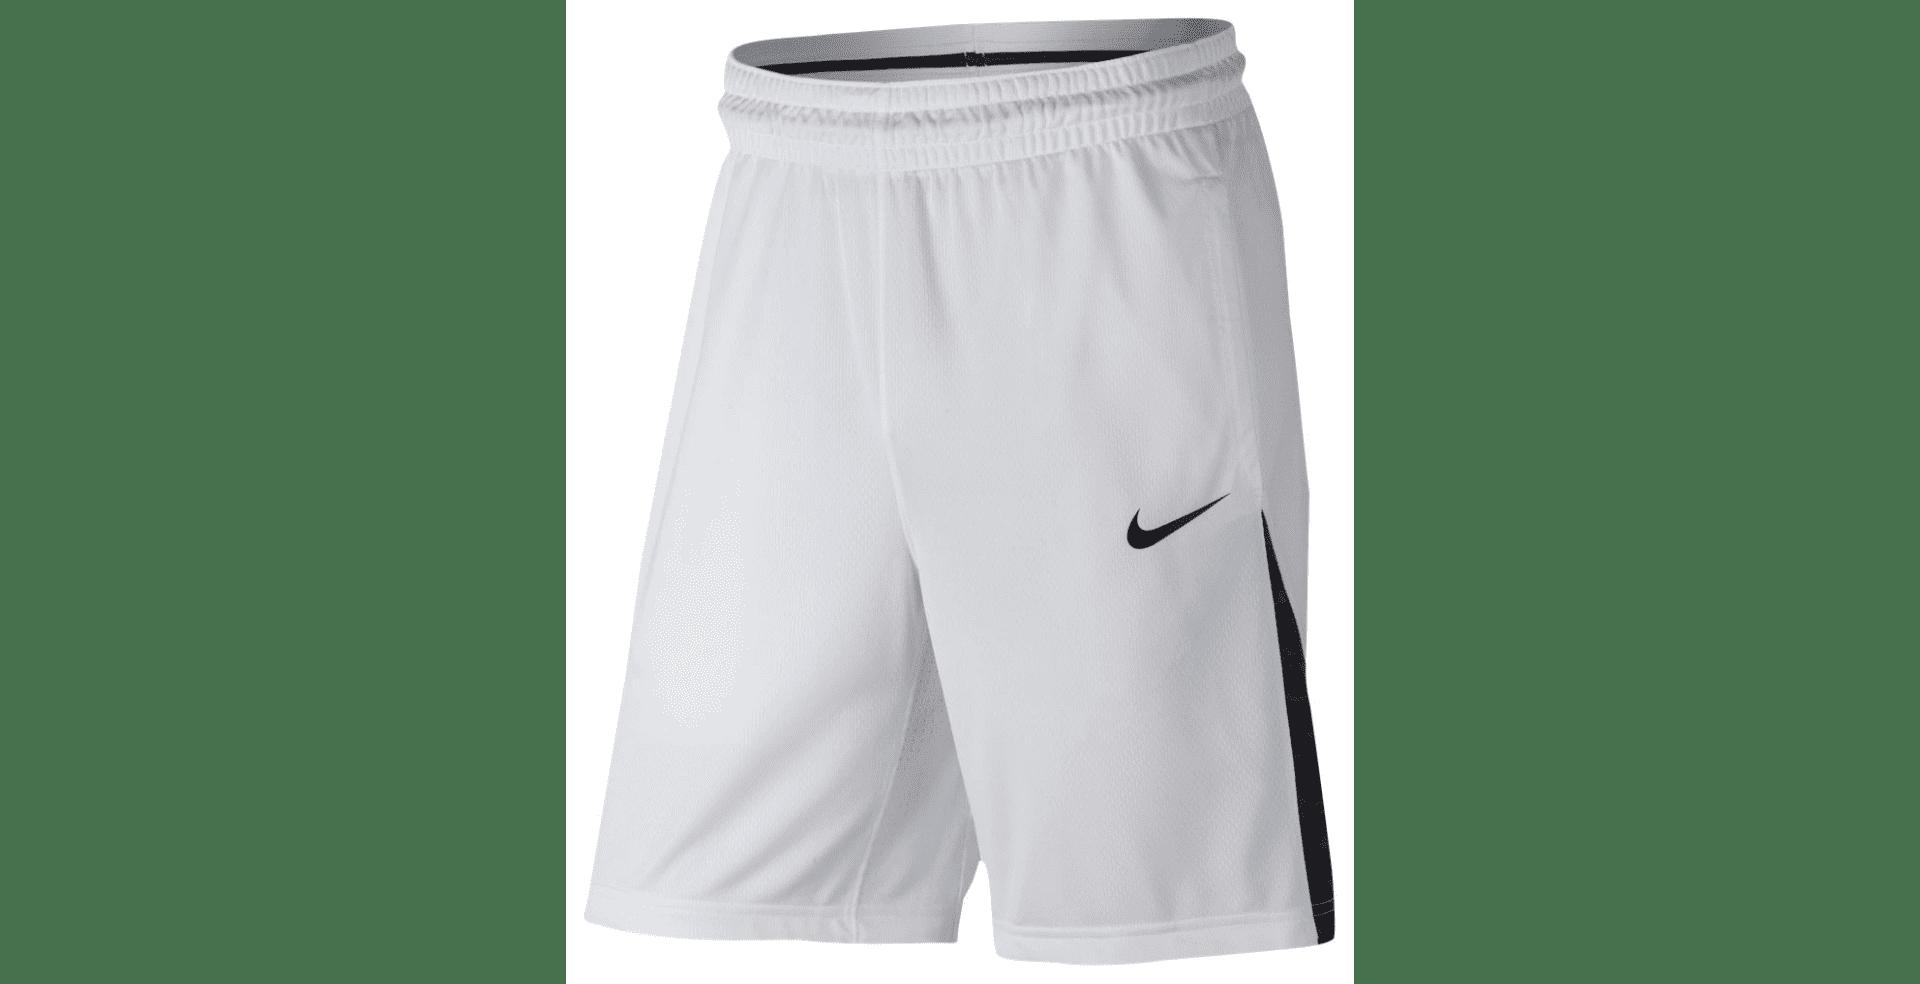 Nike 868935-100: New 3 Point Men Basketball Shorts White Black (L, Black White) by Nike